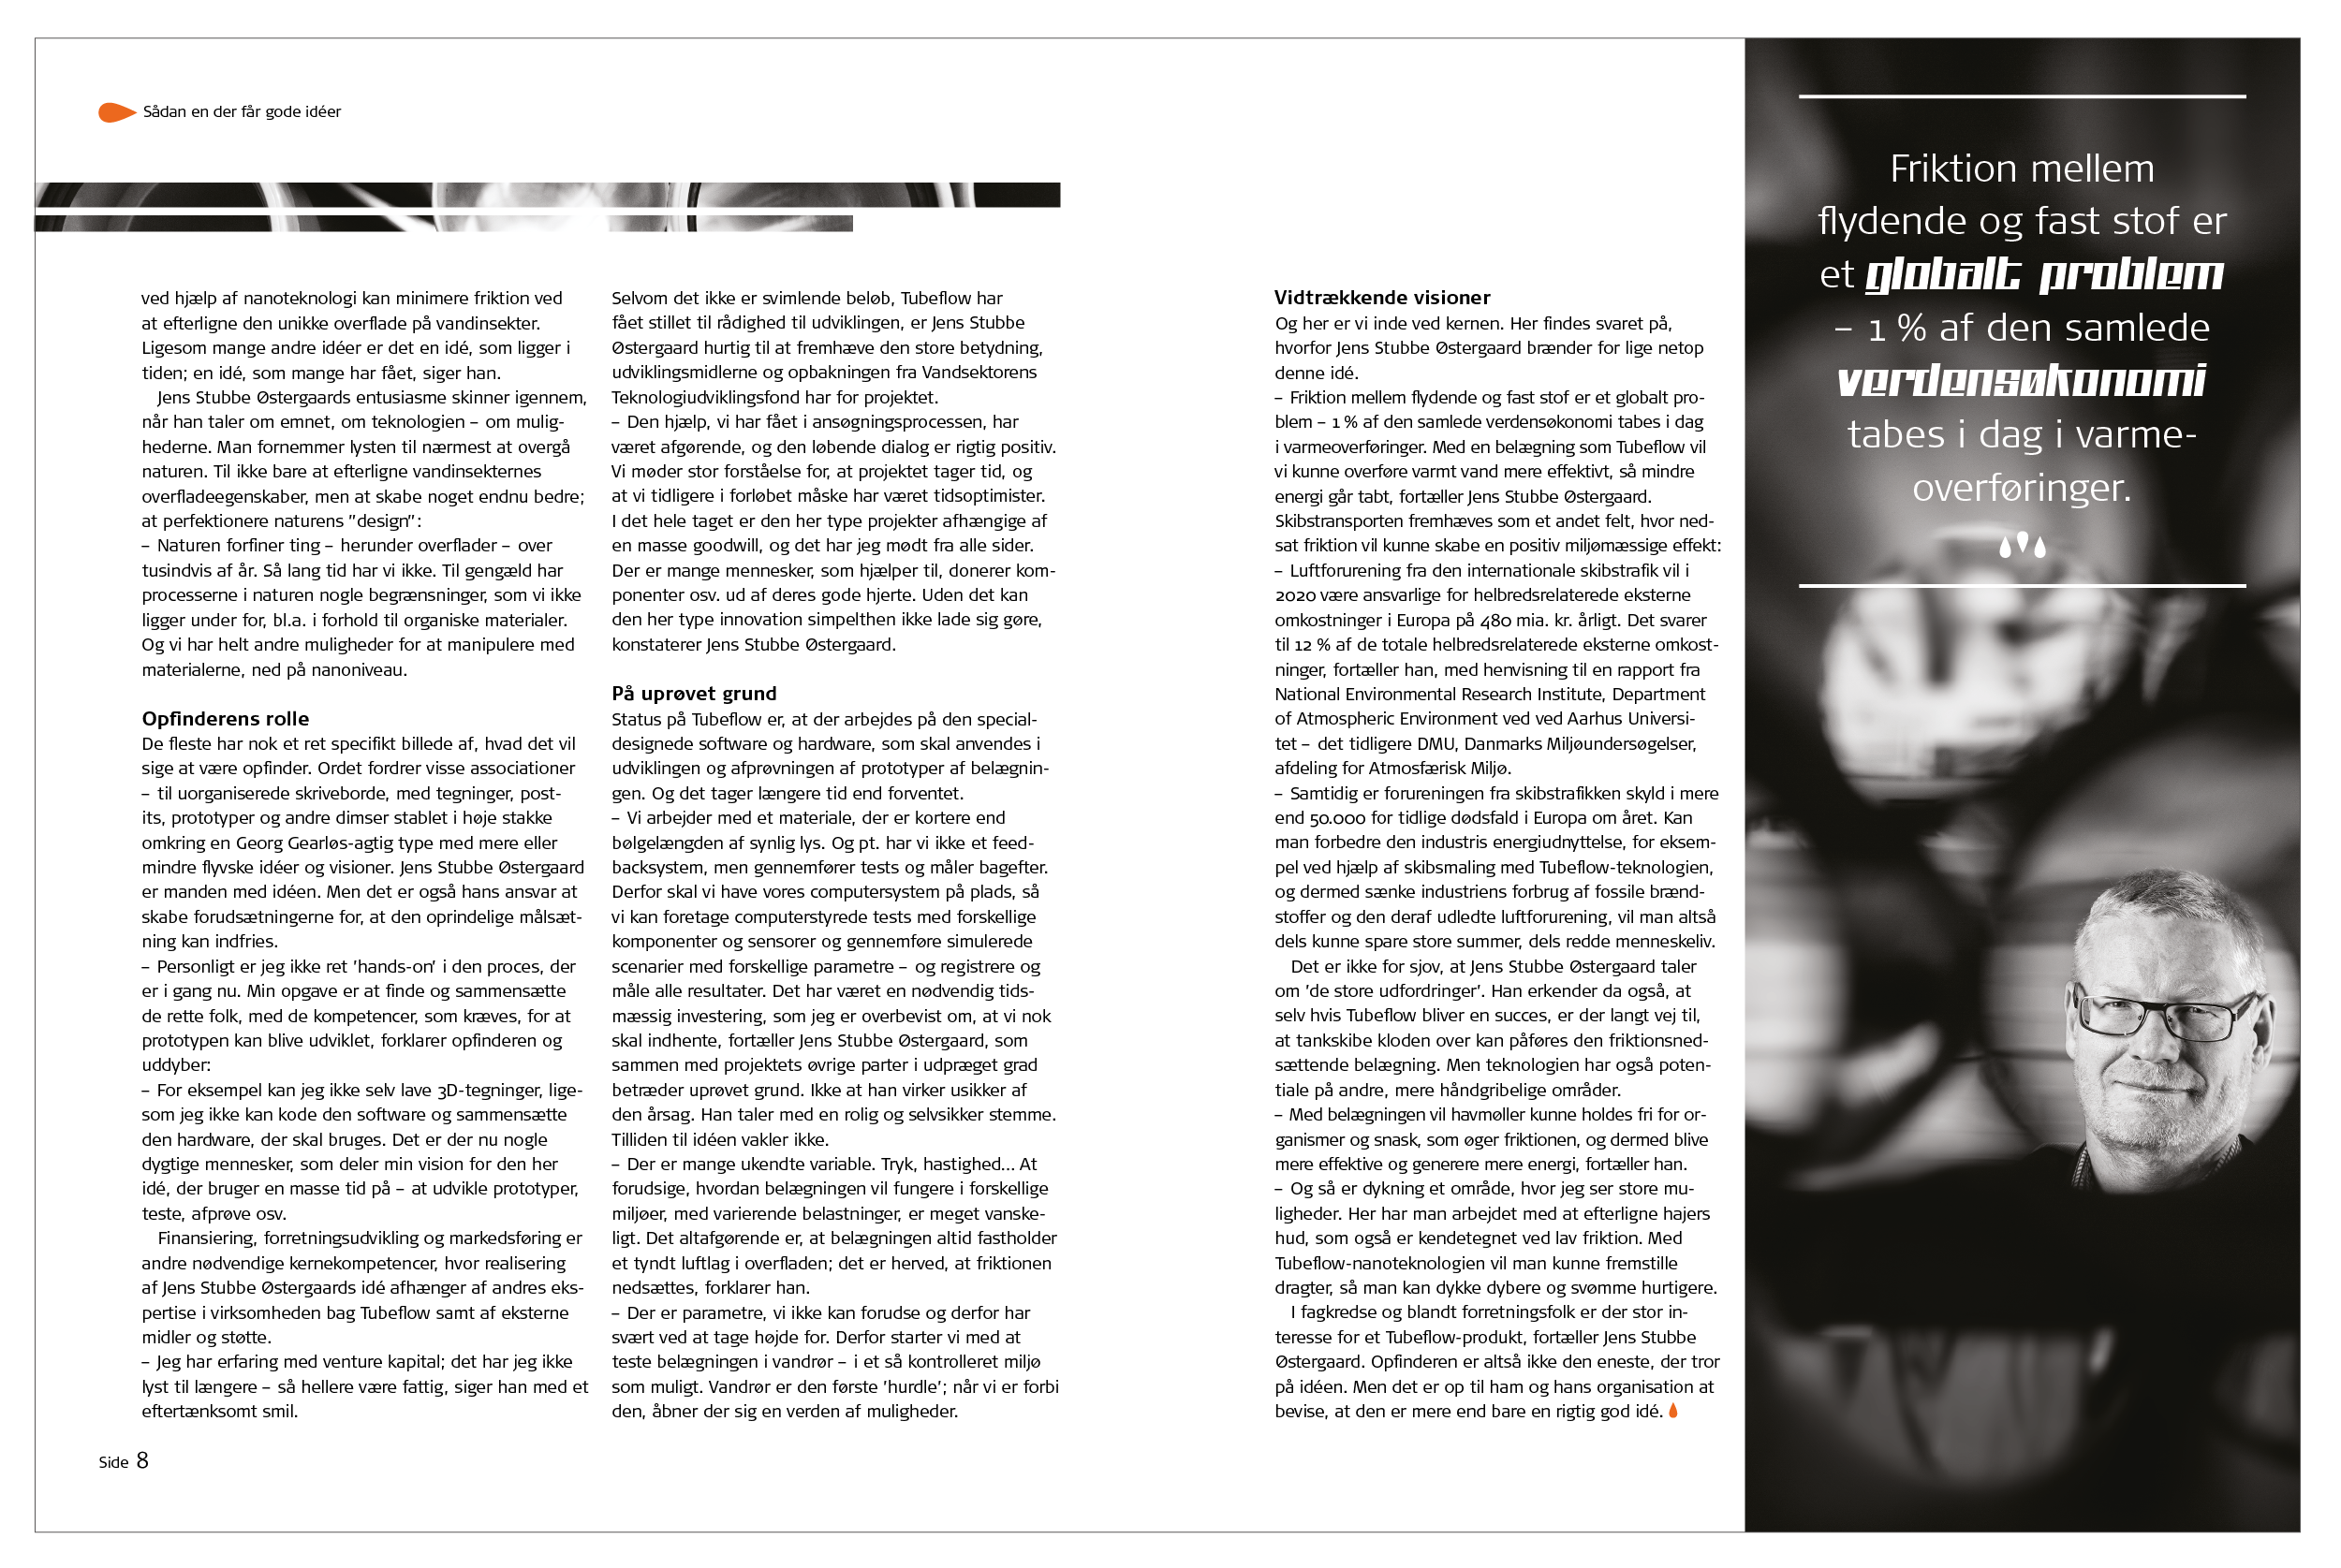 vtu-fonden, magasin, grafisk design, krims, maria refsgaard, aarhus, freelance